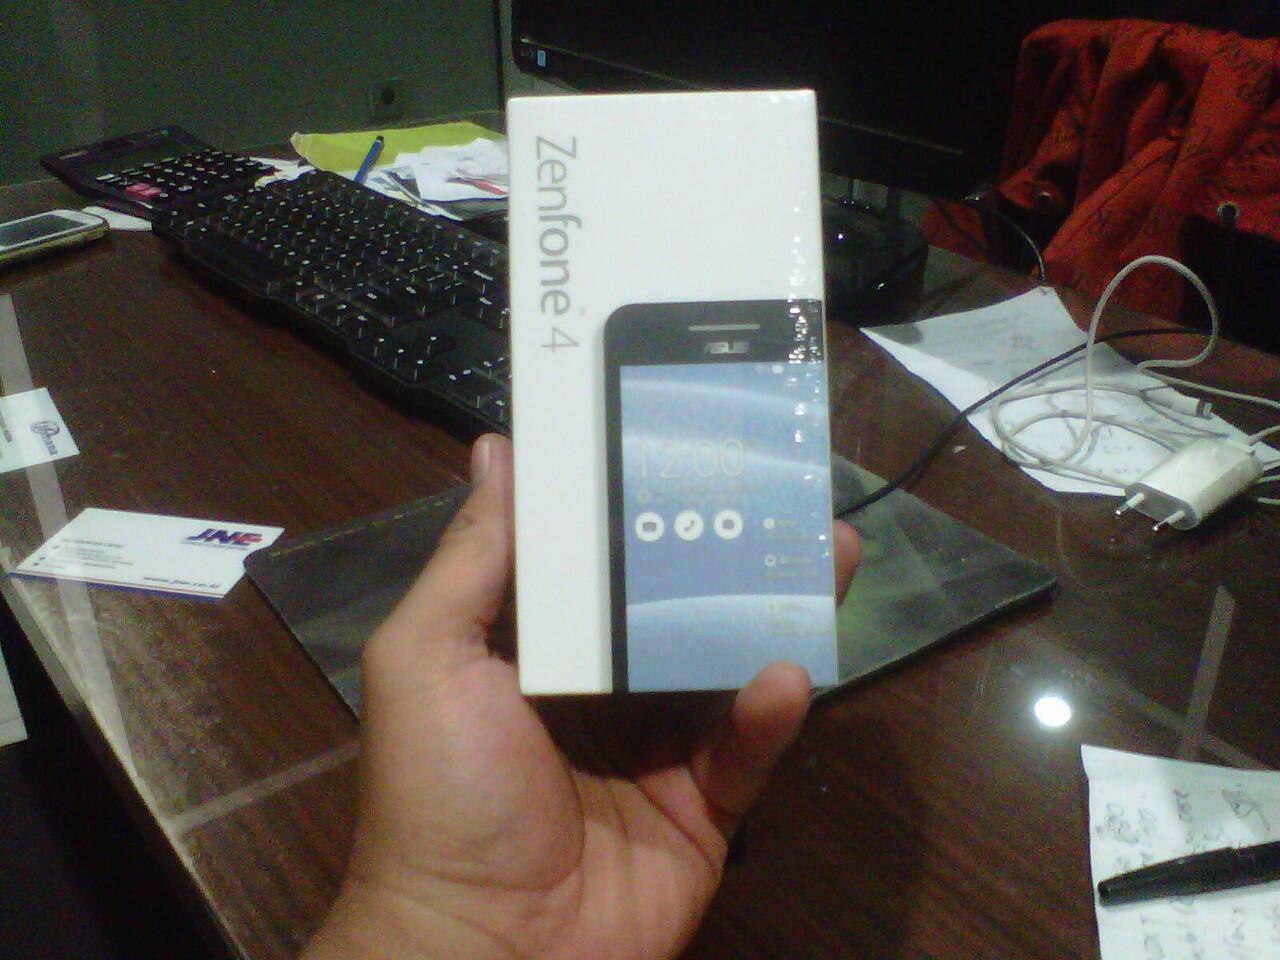 [VERDE] READY STOCK Asus Zenfone / Zenphone 4, 5, 6 Garansi Resmi 1 Tahun